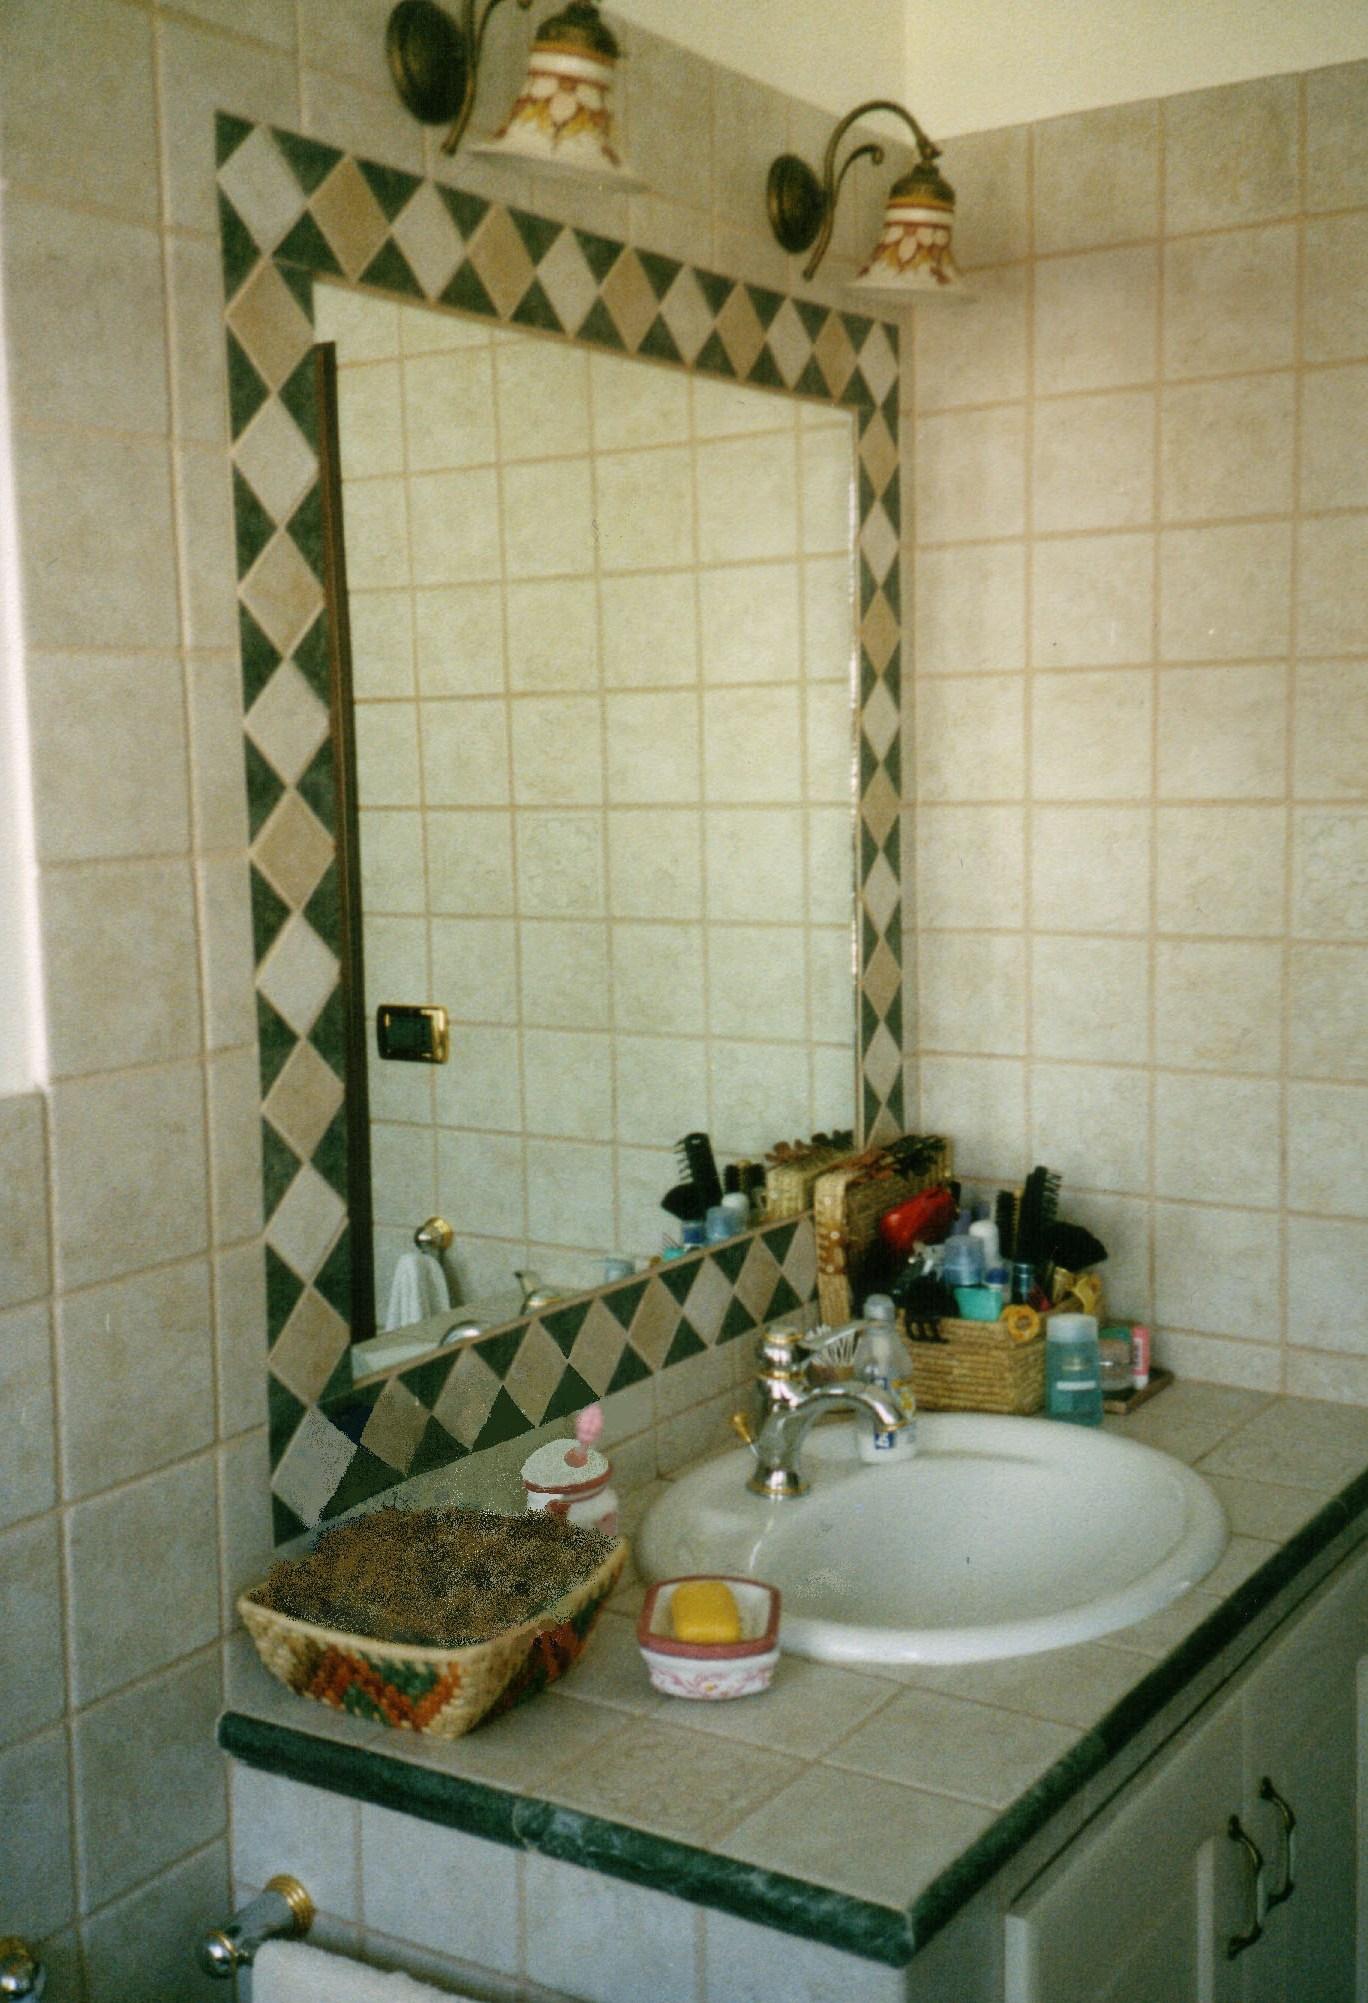 Ceramica eoliana aifaicasa - Bagno arredamento piastrelle ...